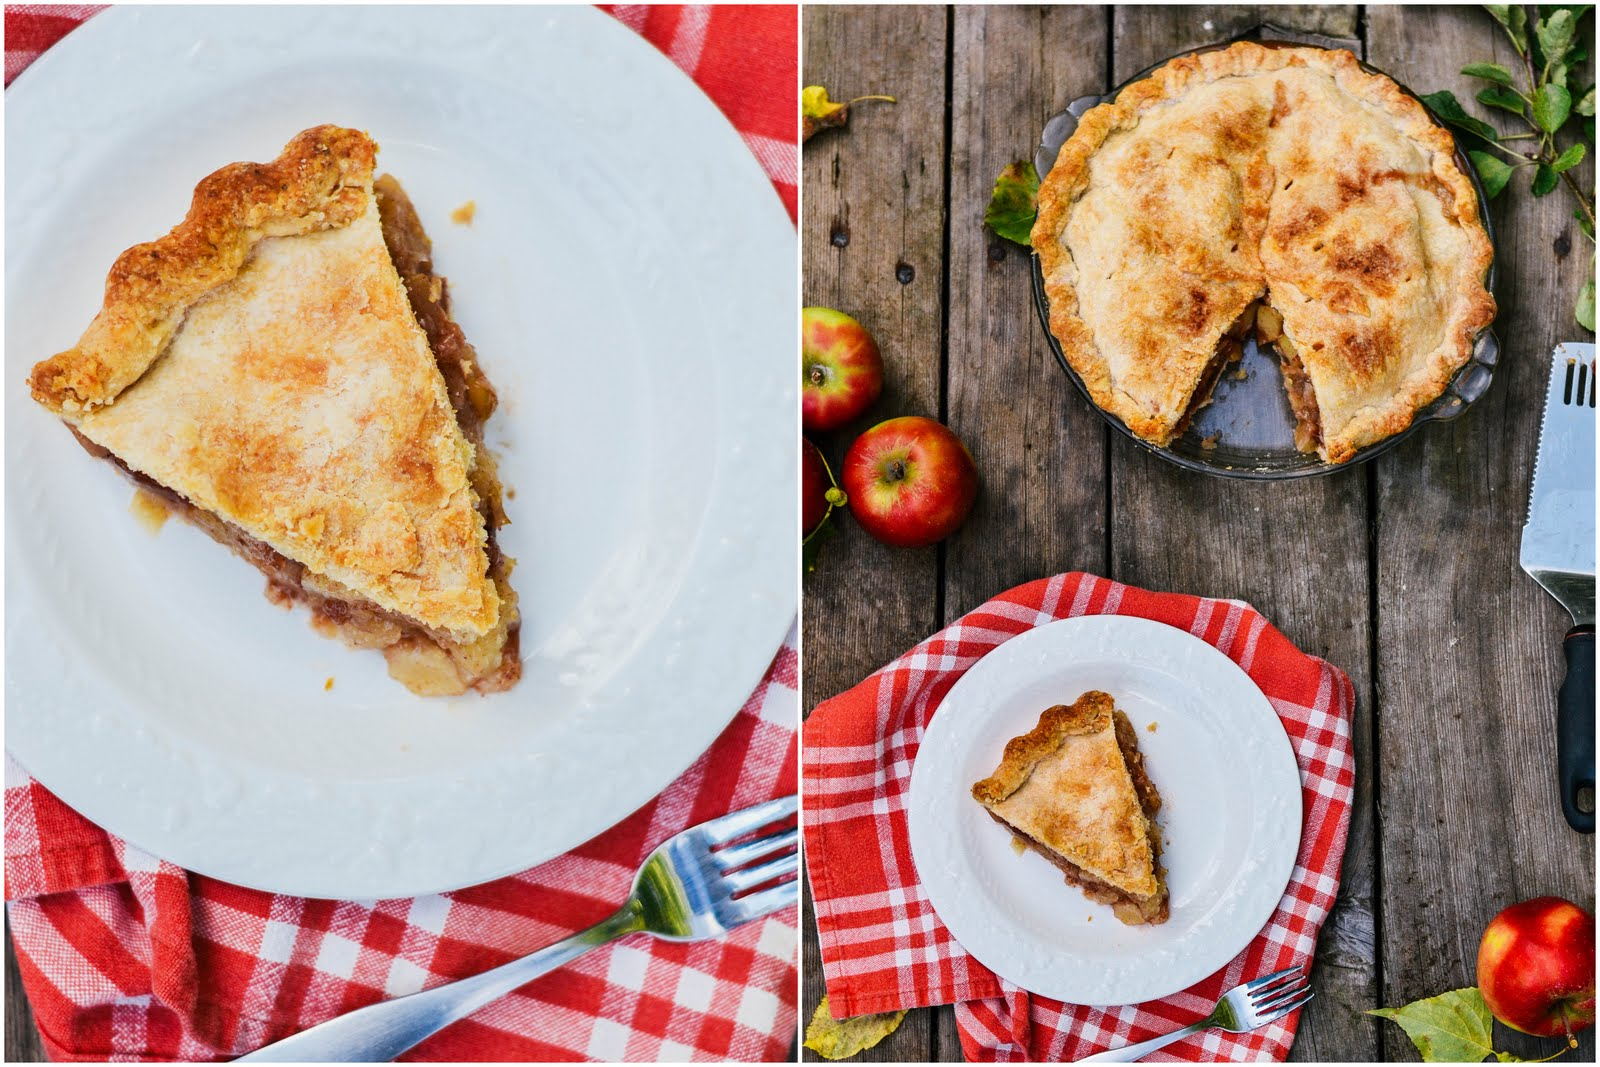 apple+pie%252C+pop%252C+tarts.jpg